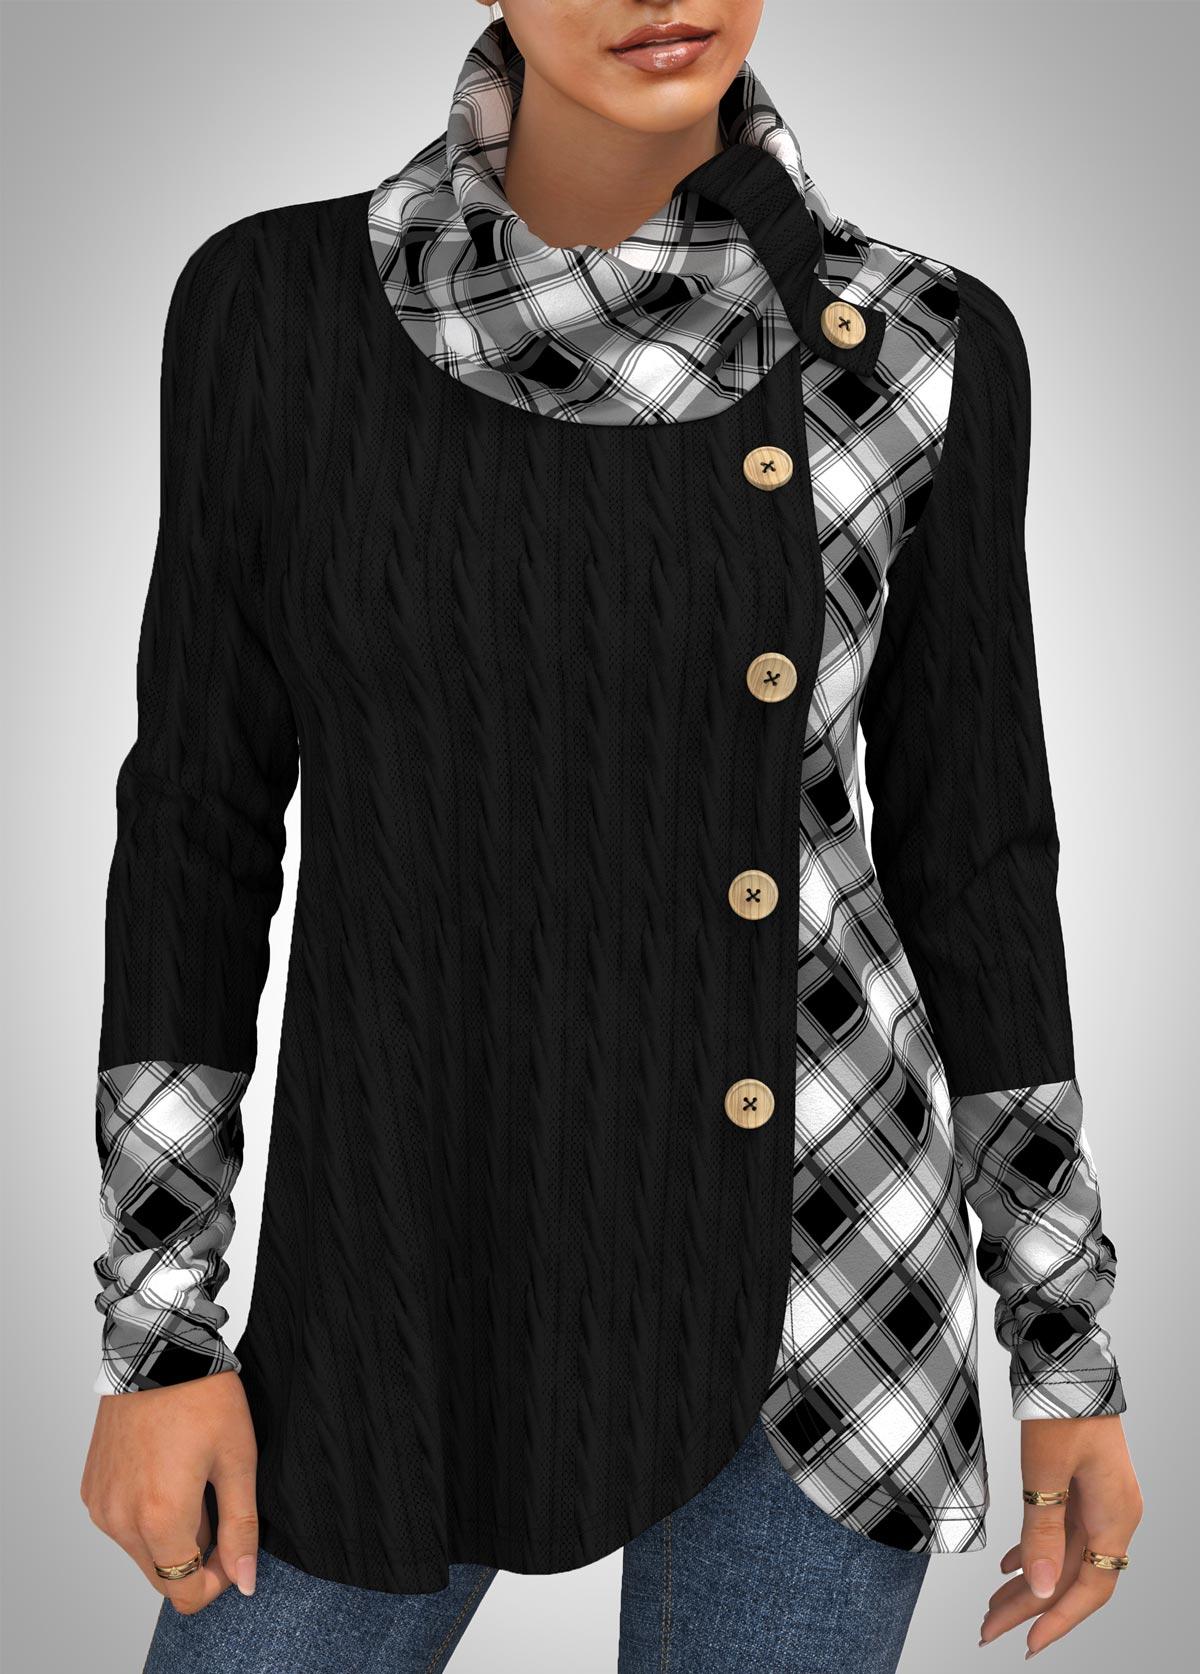 ROTITA Plaid Decorative Button Cowl Neck Long Sleeve Sweatshirt